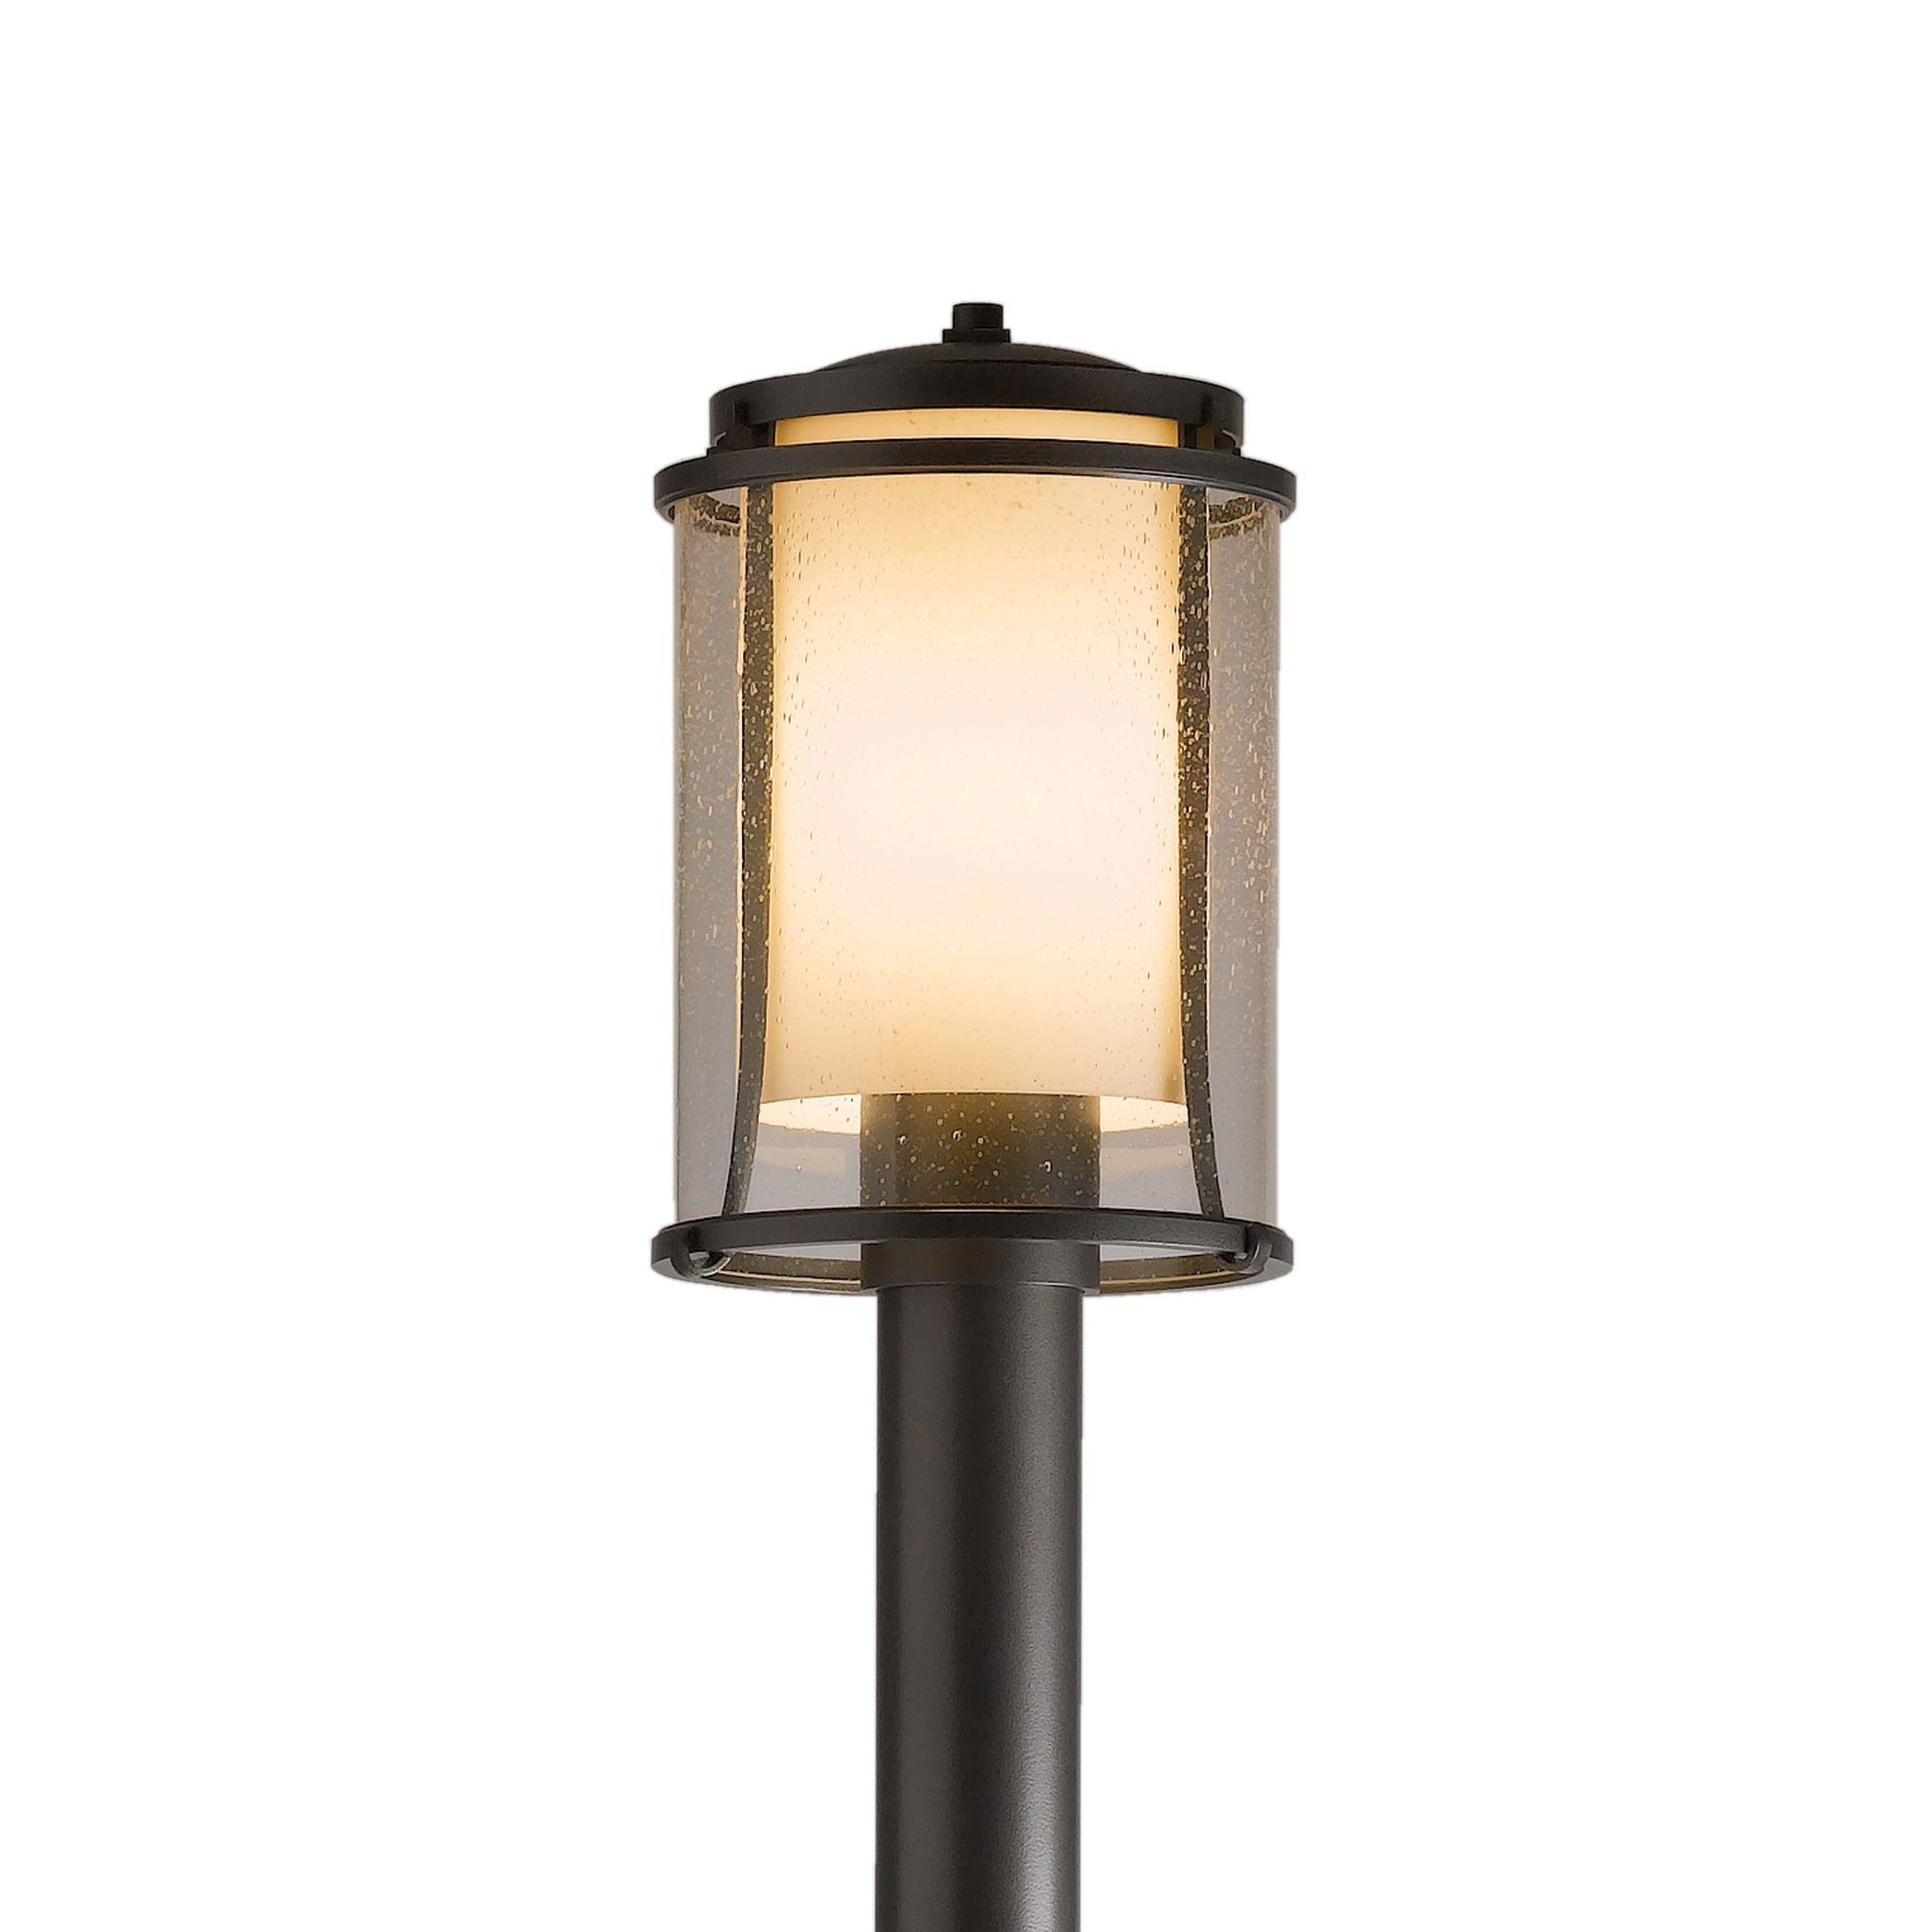 Meridian Outdoor Post Light Hubbardton Post